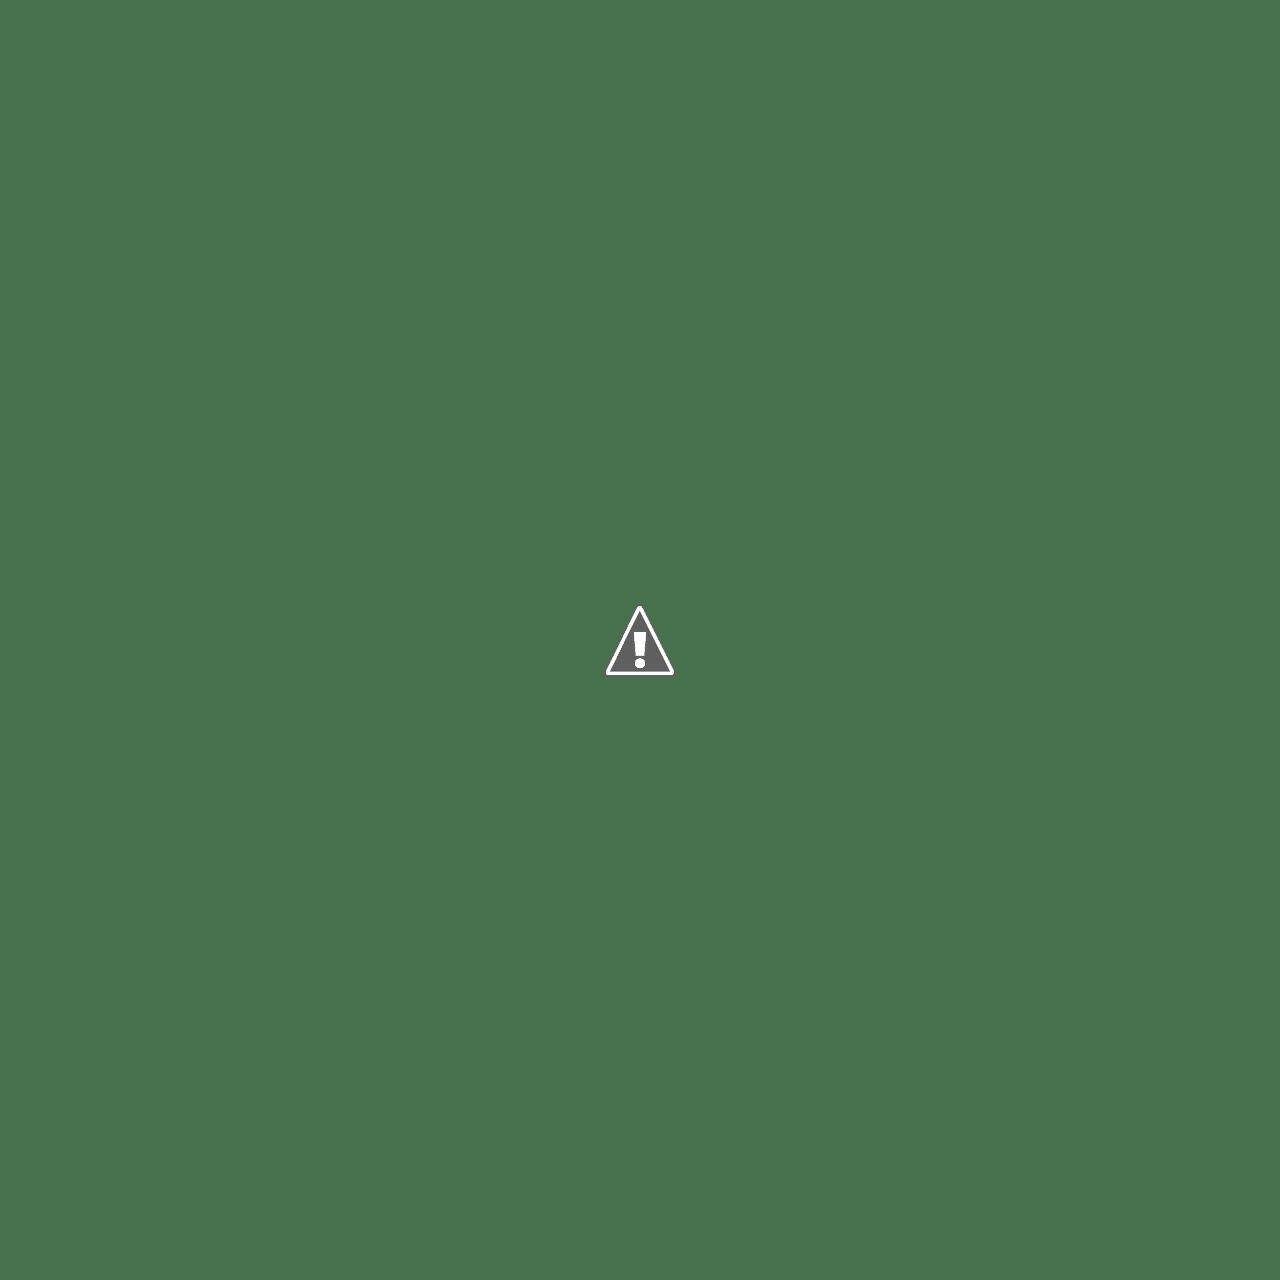 Wellness Massage - Massage Therapist in La Quinta